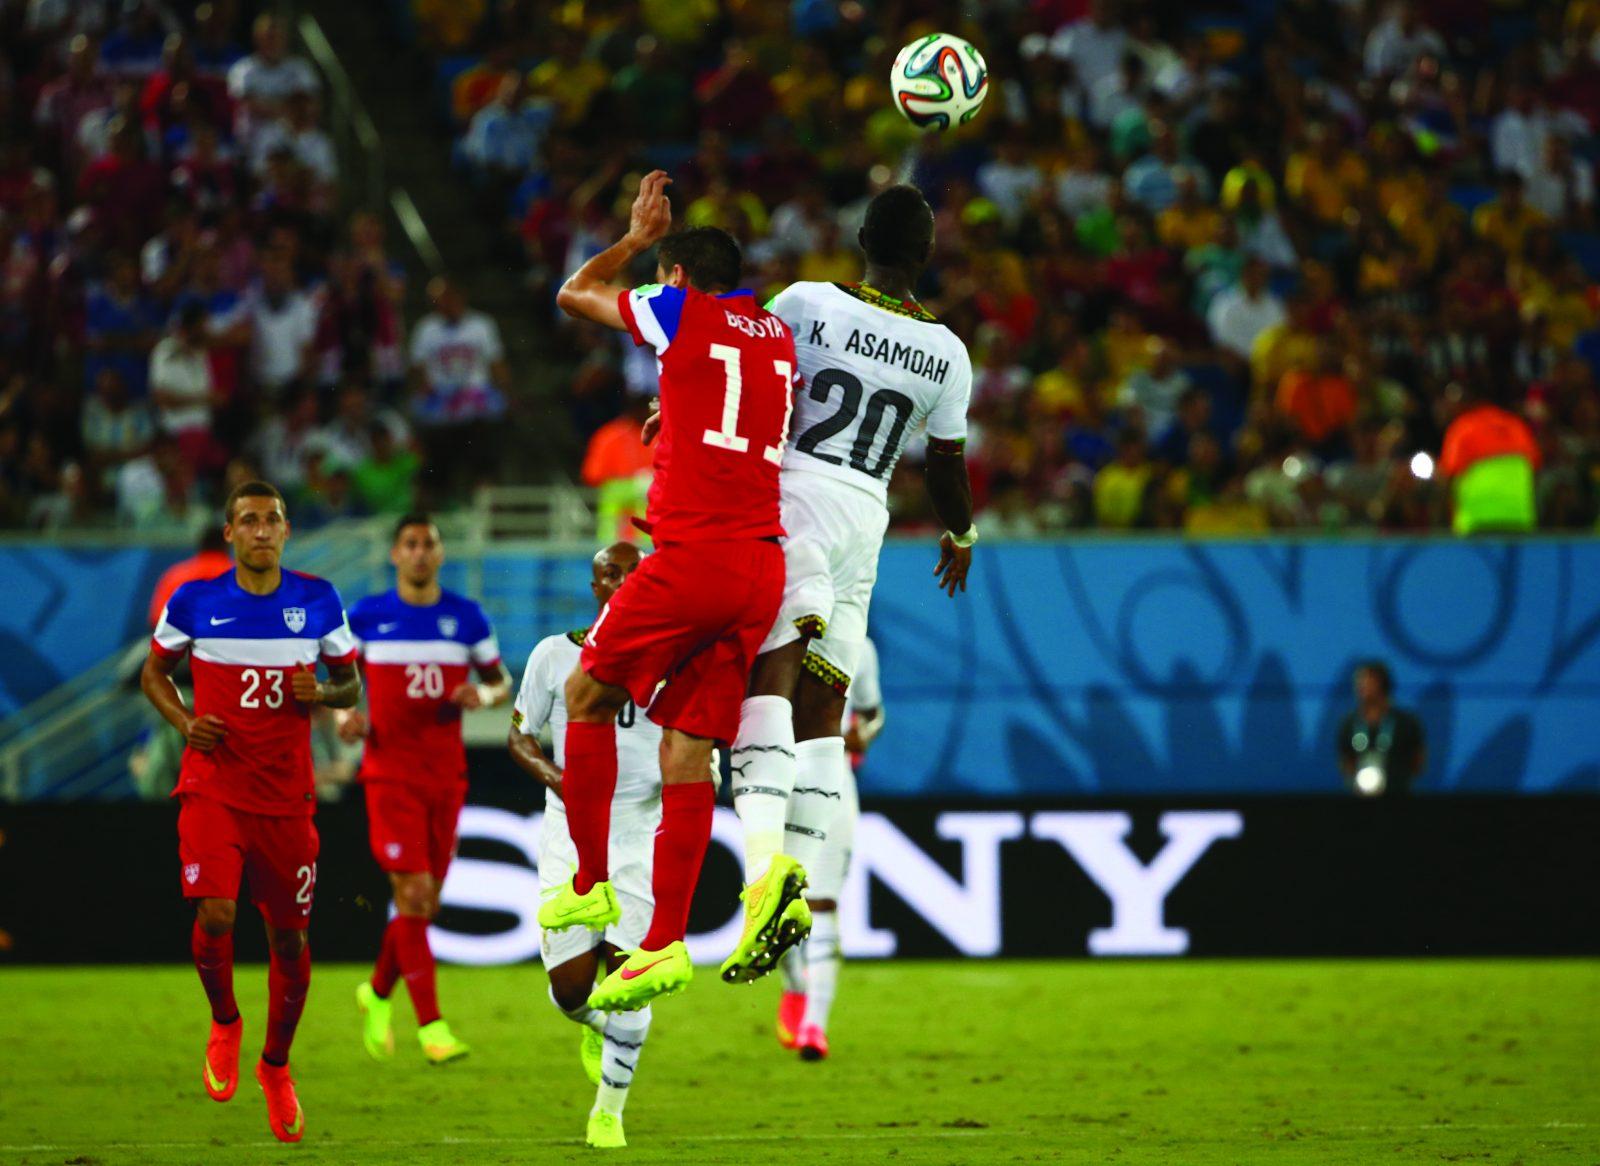 USA wins over Ghana, 2-1. Photo courtesy of Sony via Image.net.